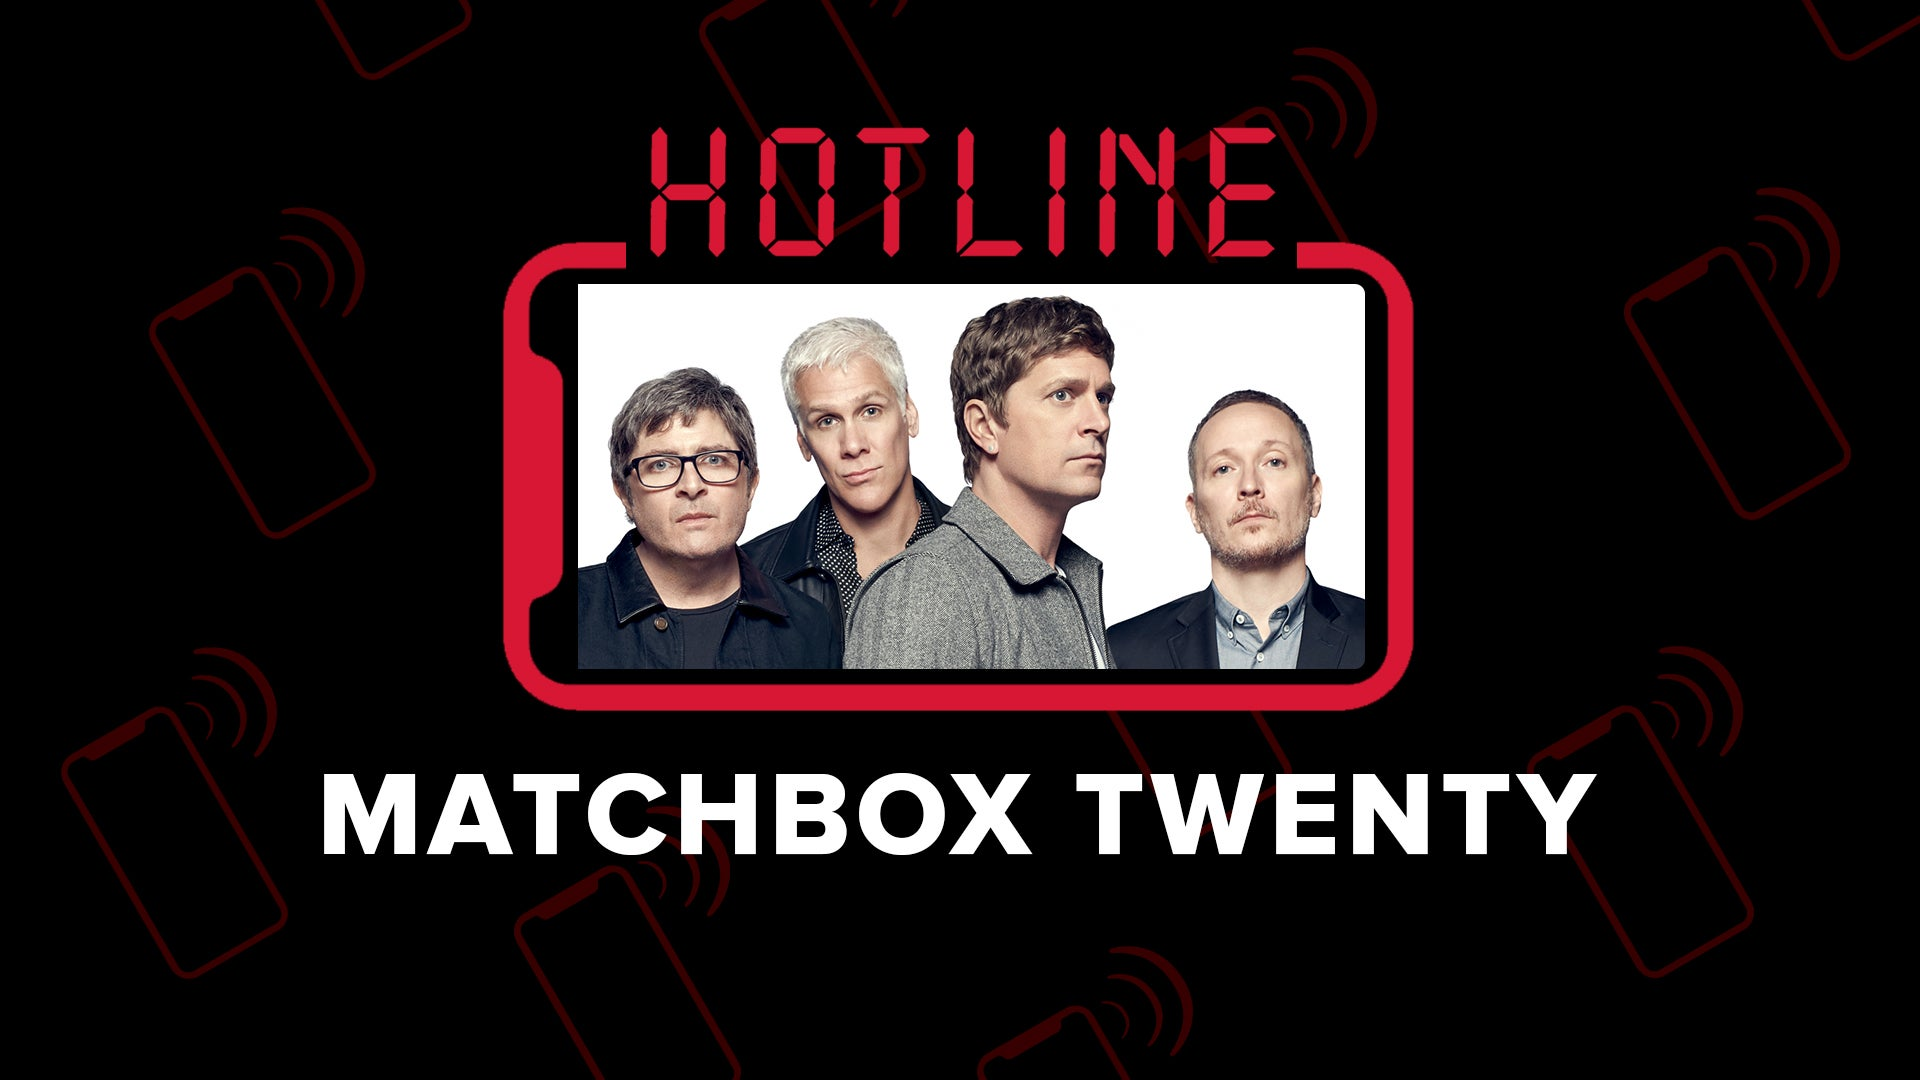 Hotline: Matchbox Twenty